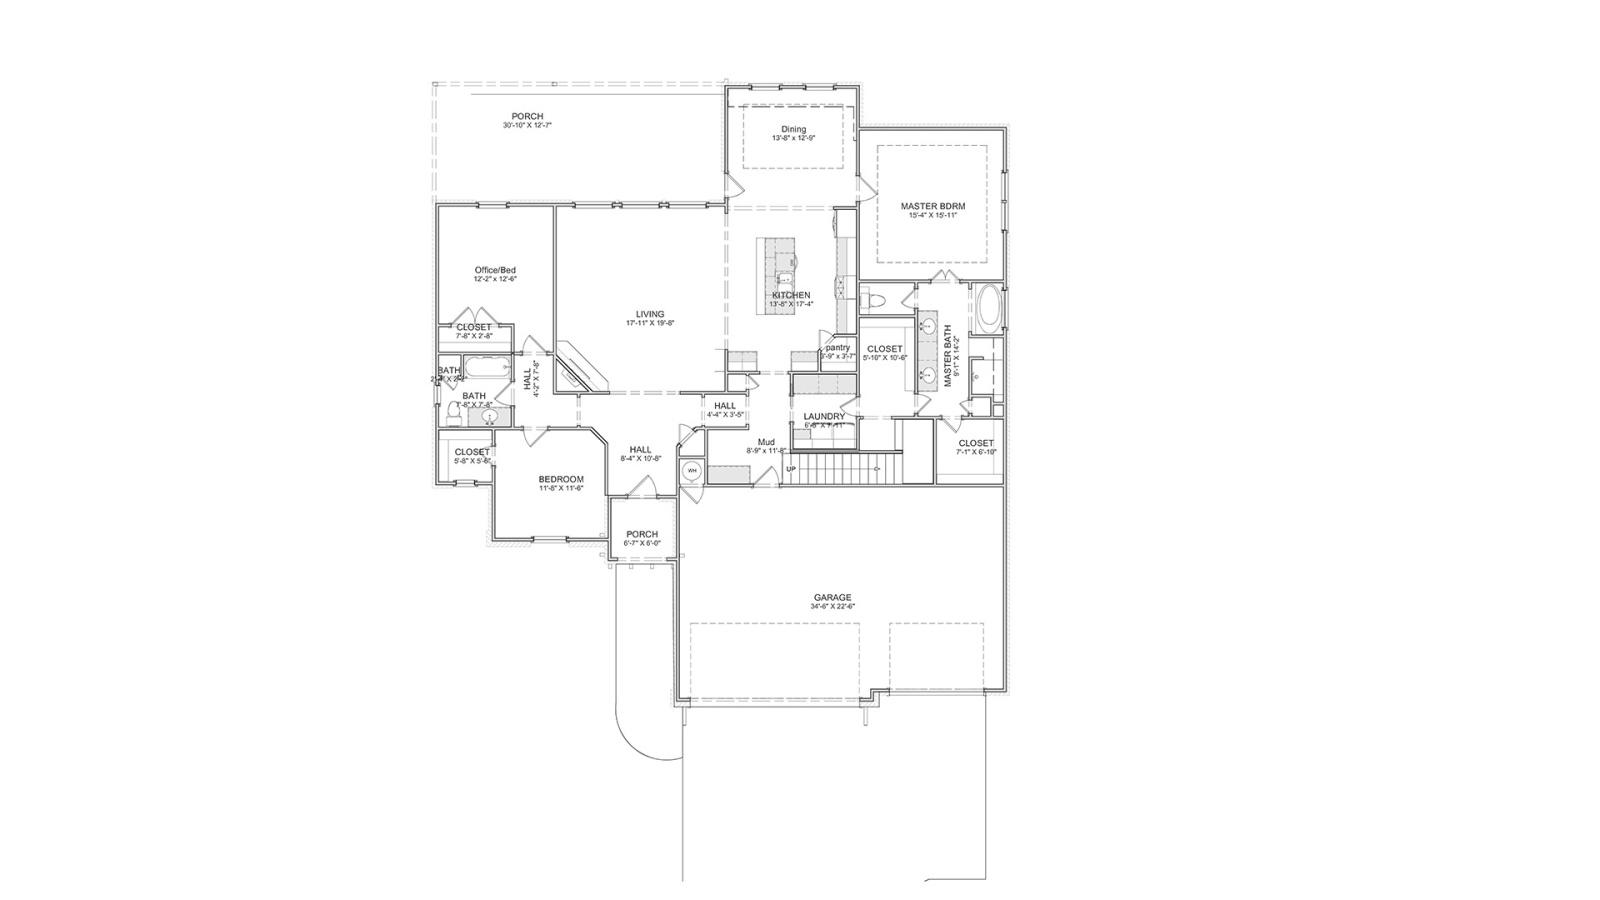 5 Bedrooms Bedrooms, ,3 BathroomsBathrooms,Custom Home,Home Plans,1013